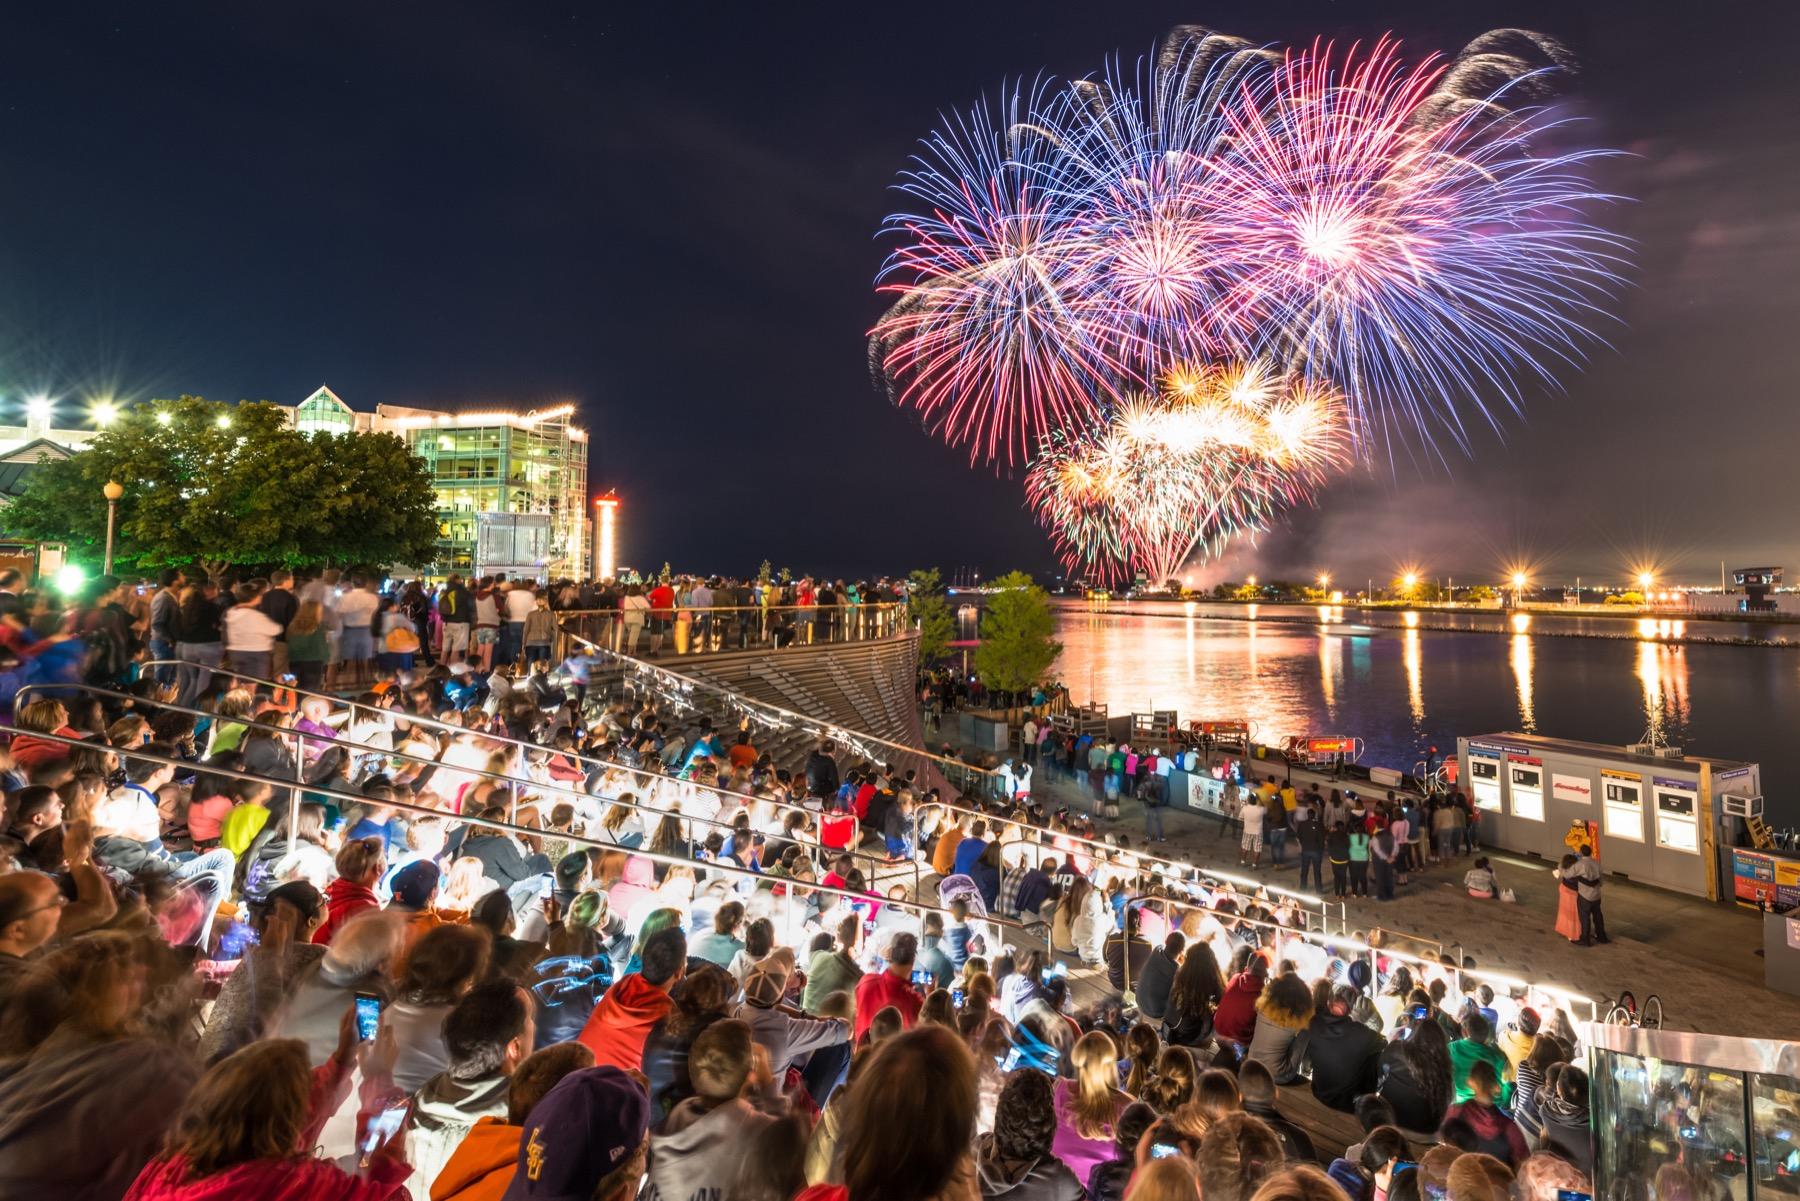 Aon Summer Fireworks